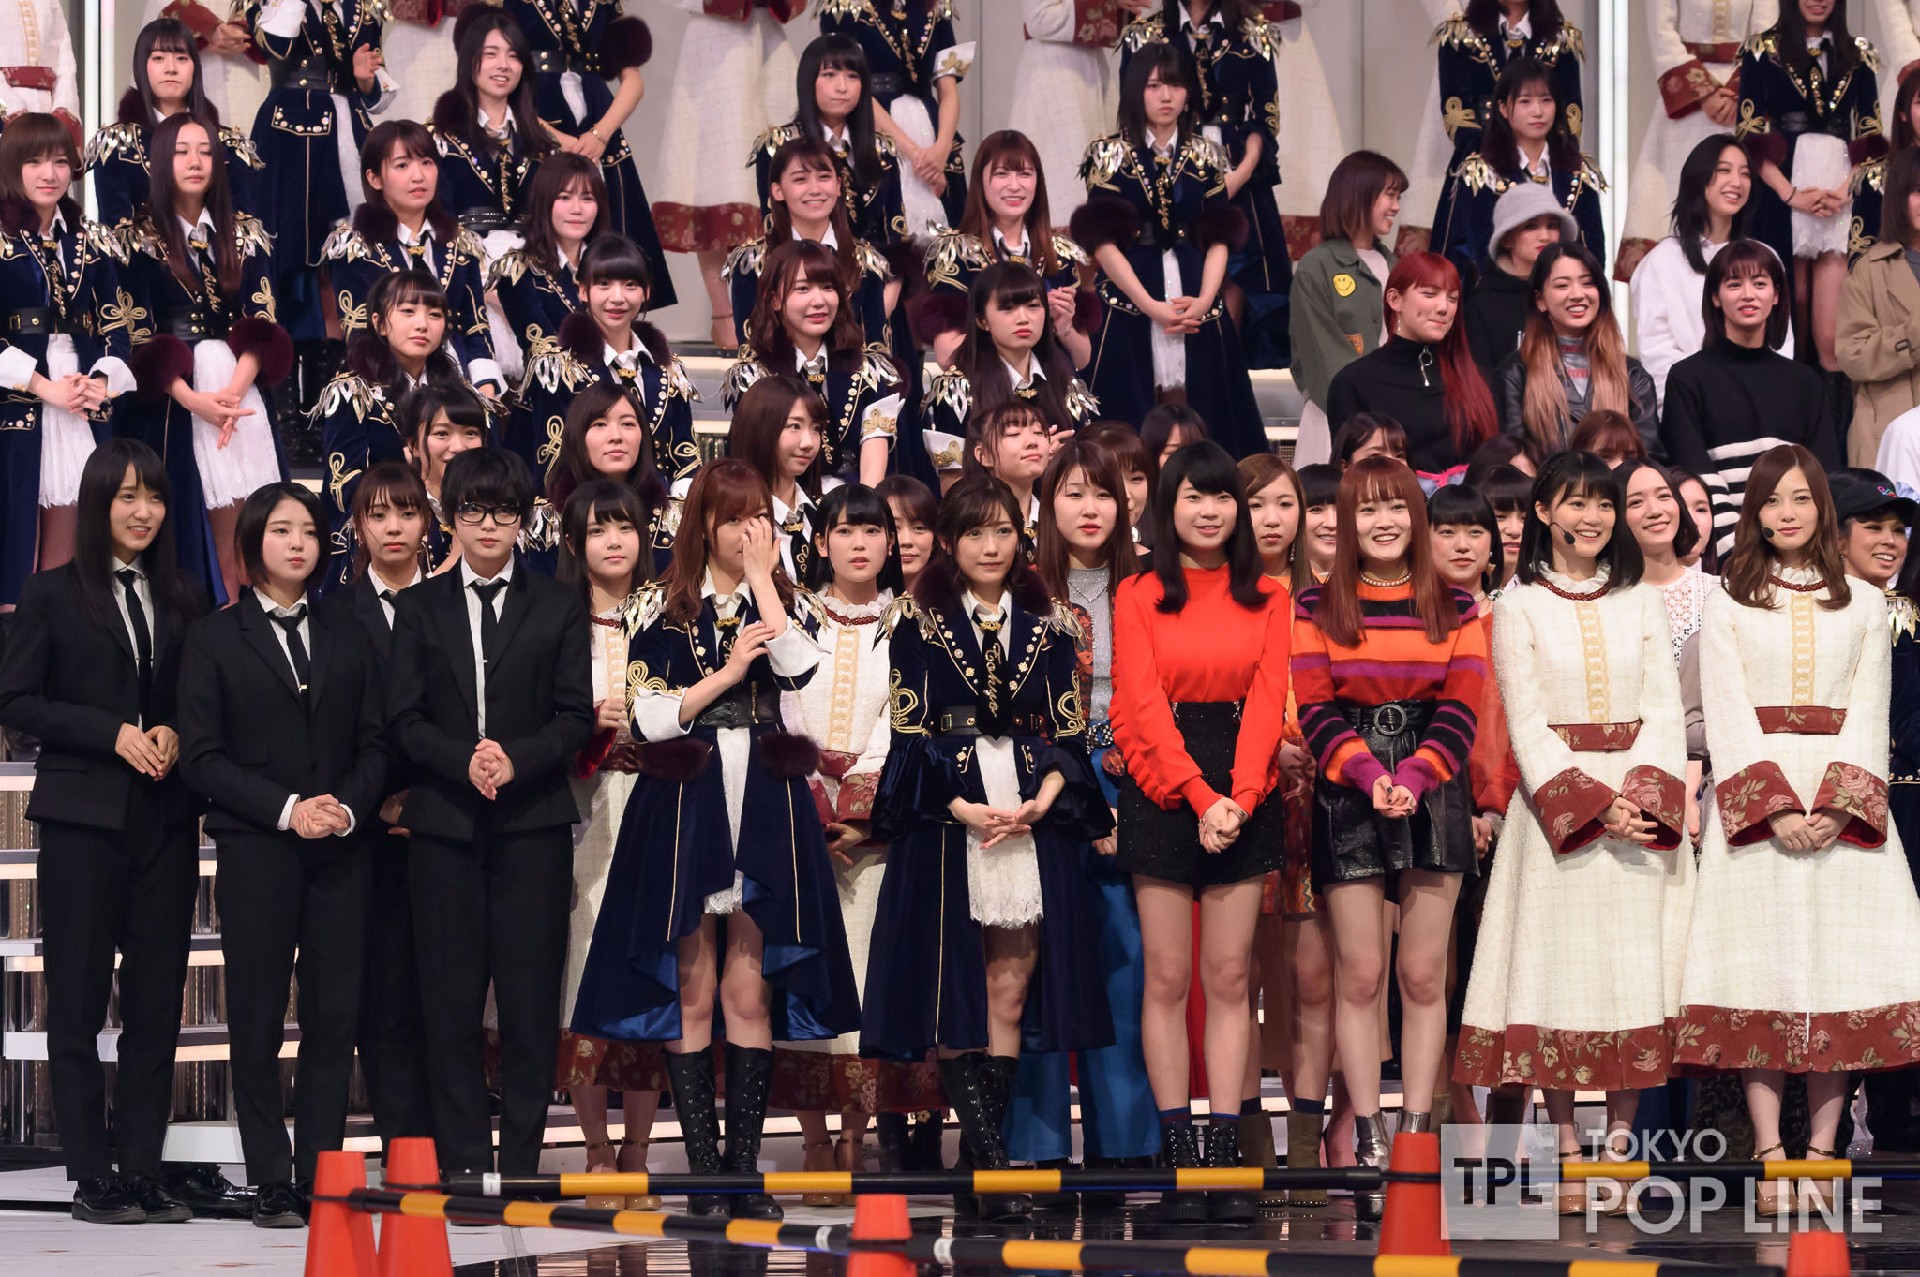 【画像】乃木坂46、紅白で全アイドルを公開処刑した結果wwwwwwwwwwww